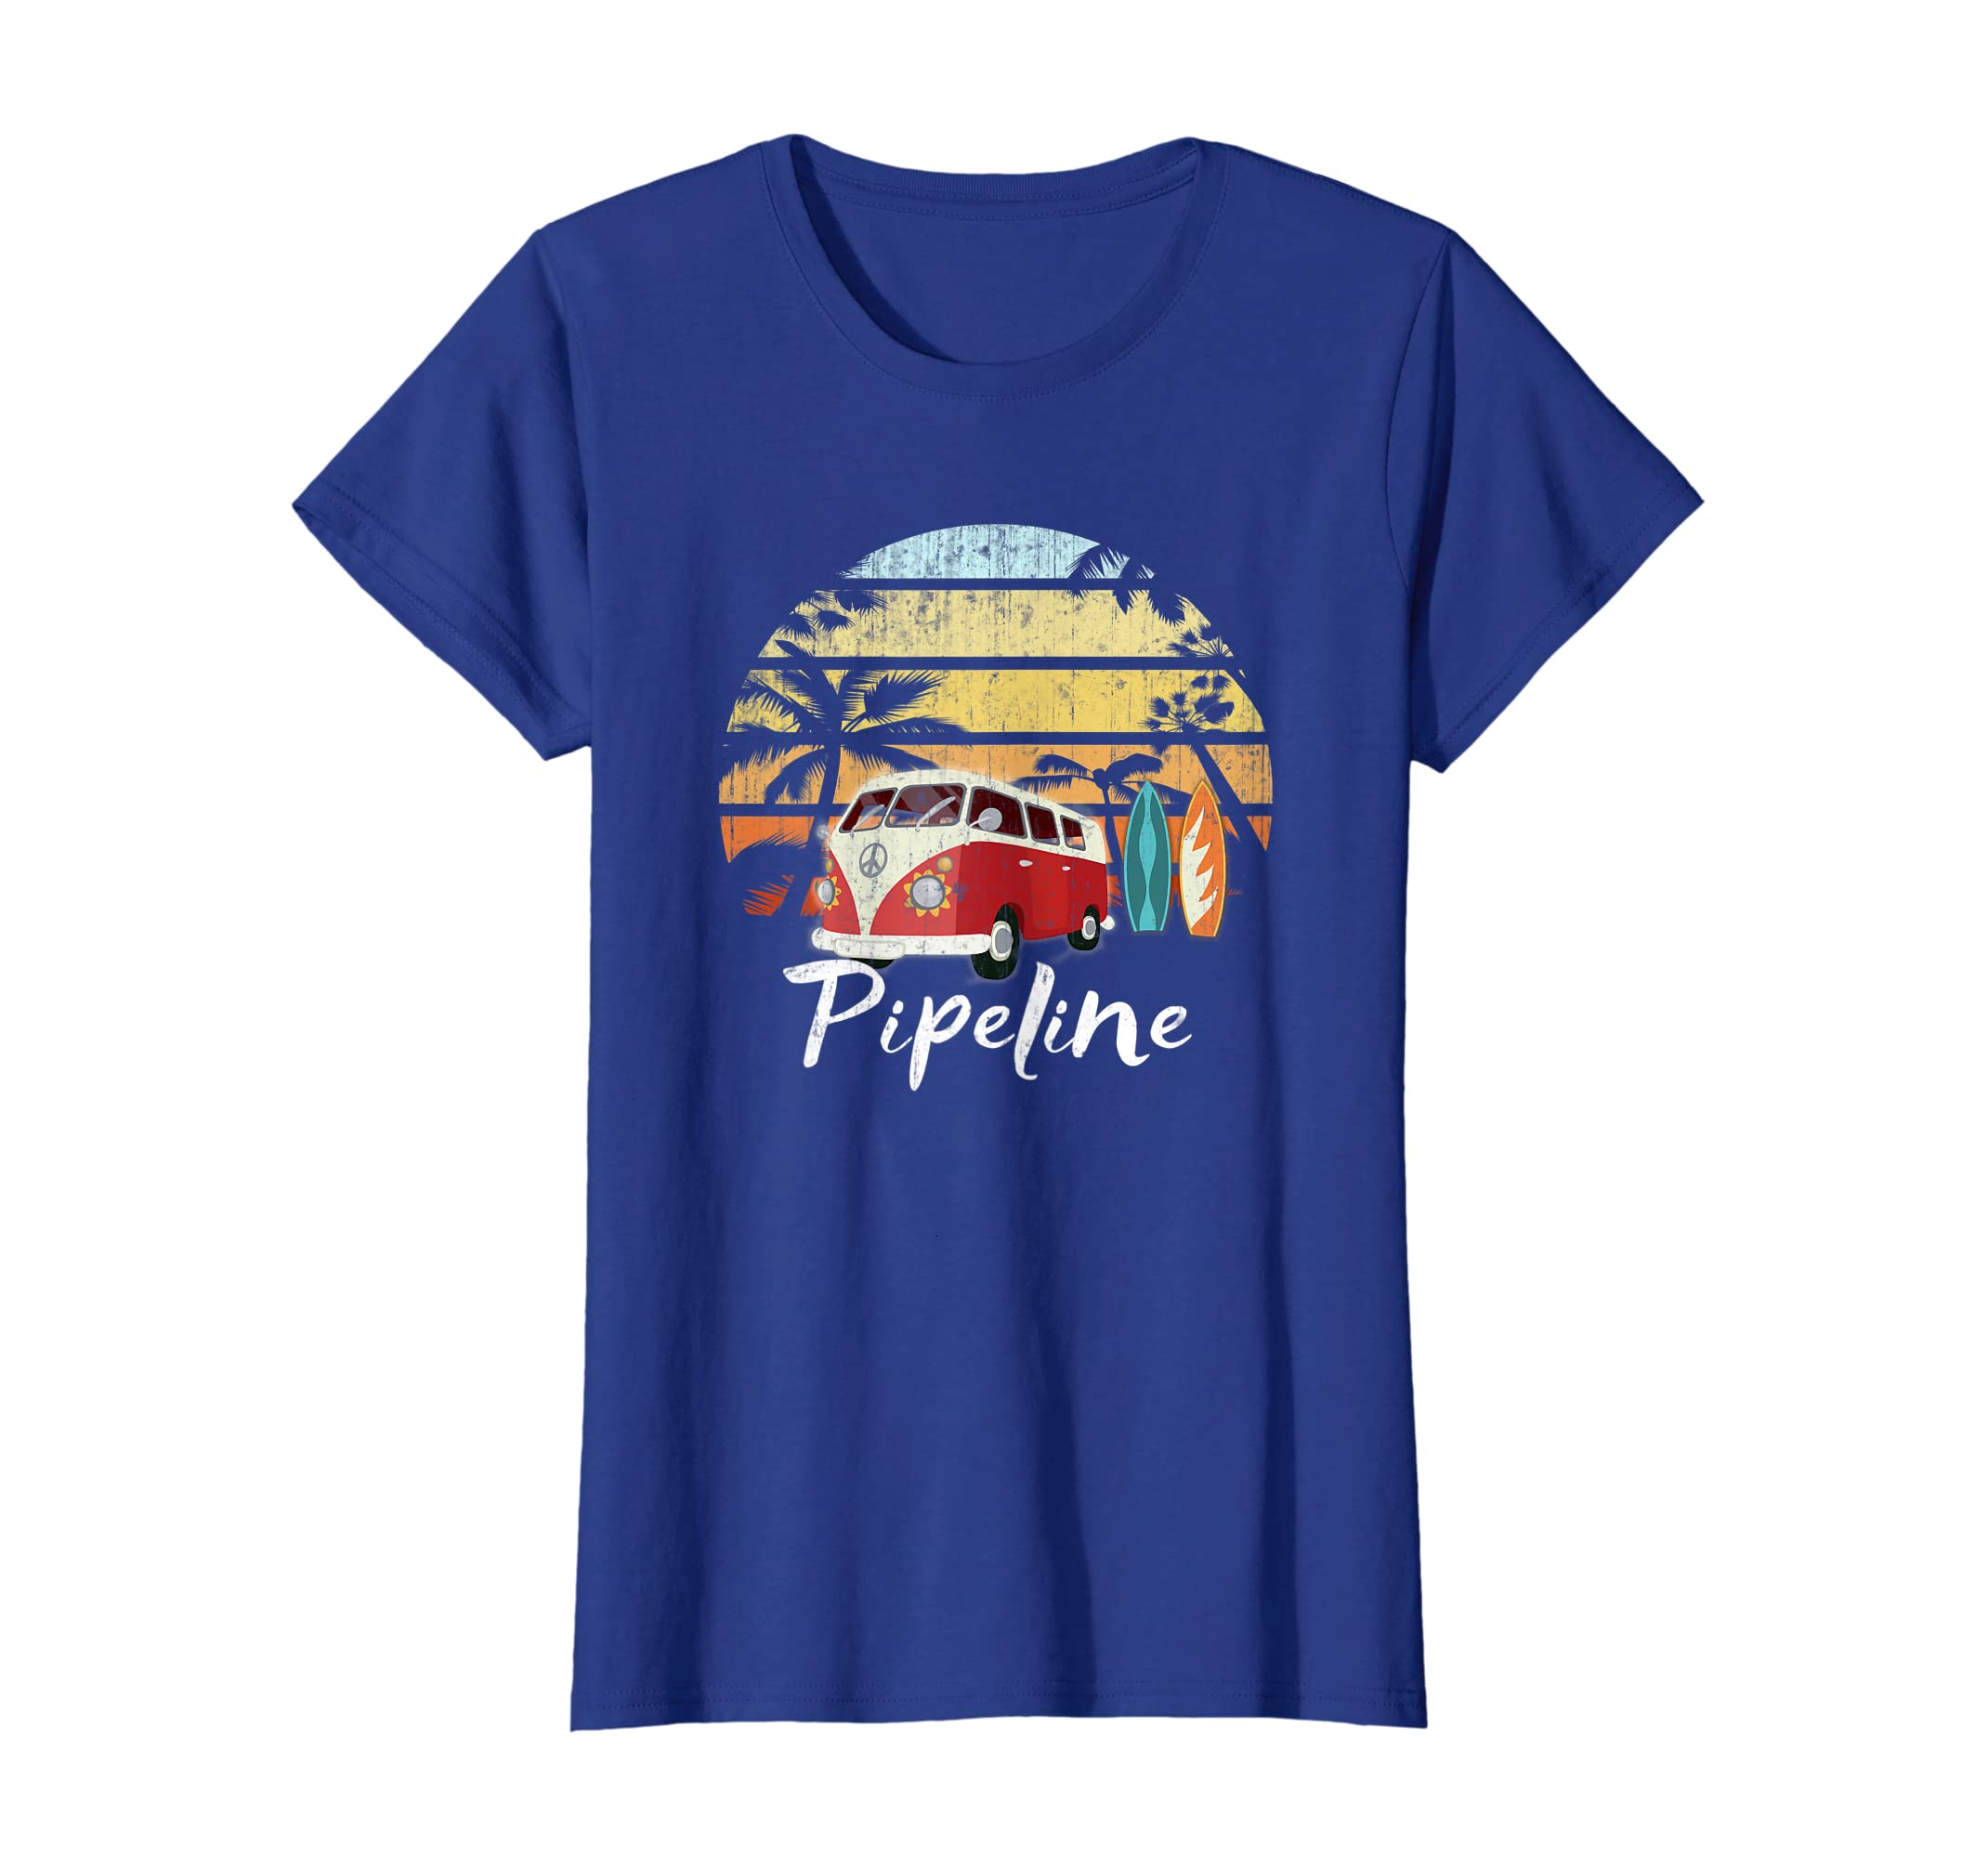 0b3c71cf Amazon.com: Cool Retro Banzai Pipeline Surf Beach Vintage Hawaii 70s Tee:  Clothing